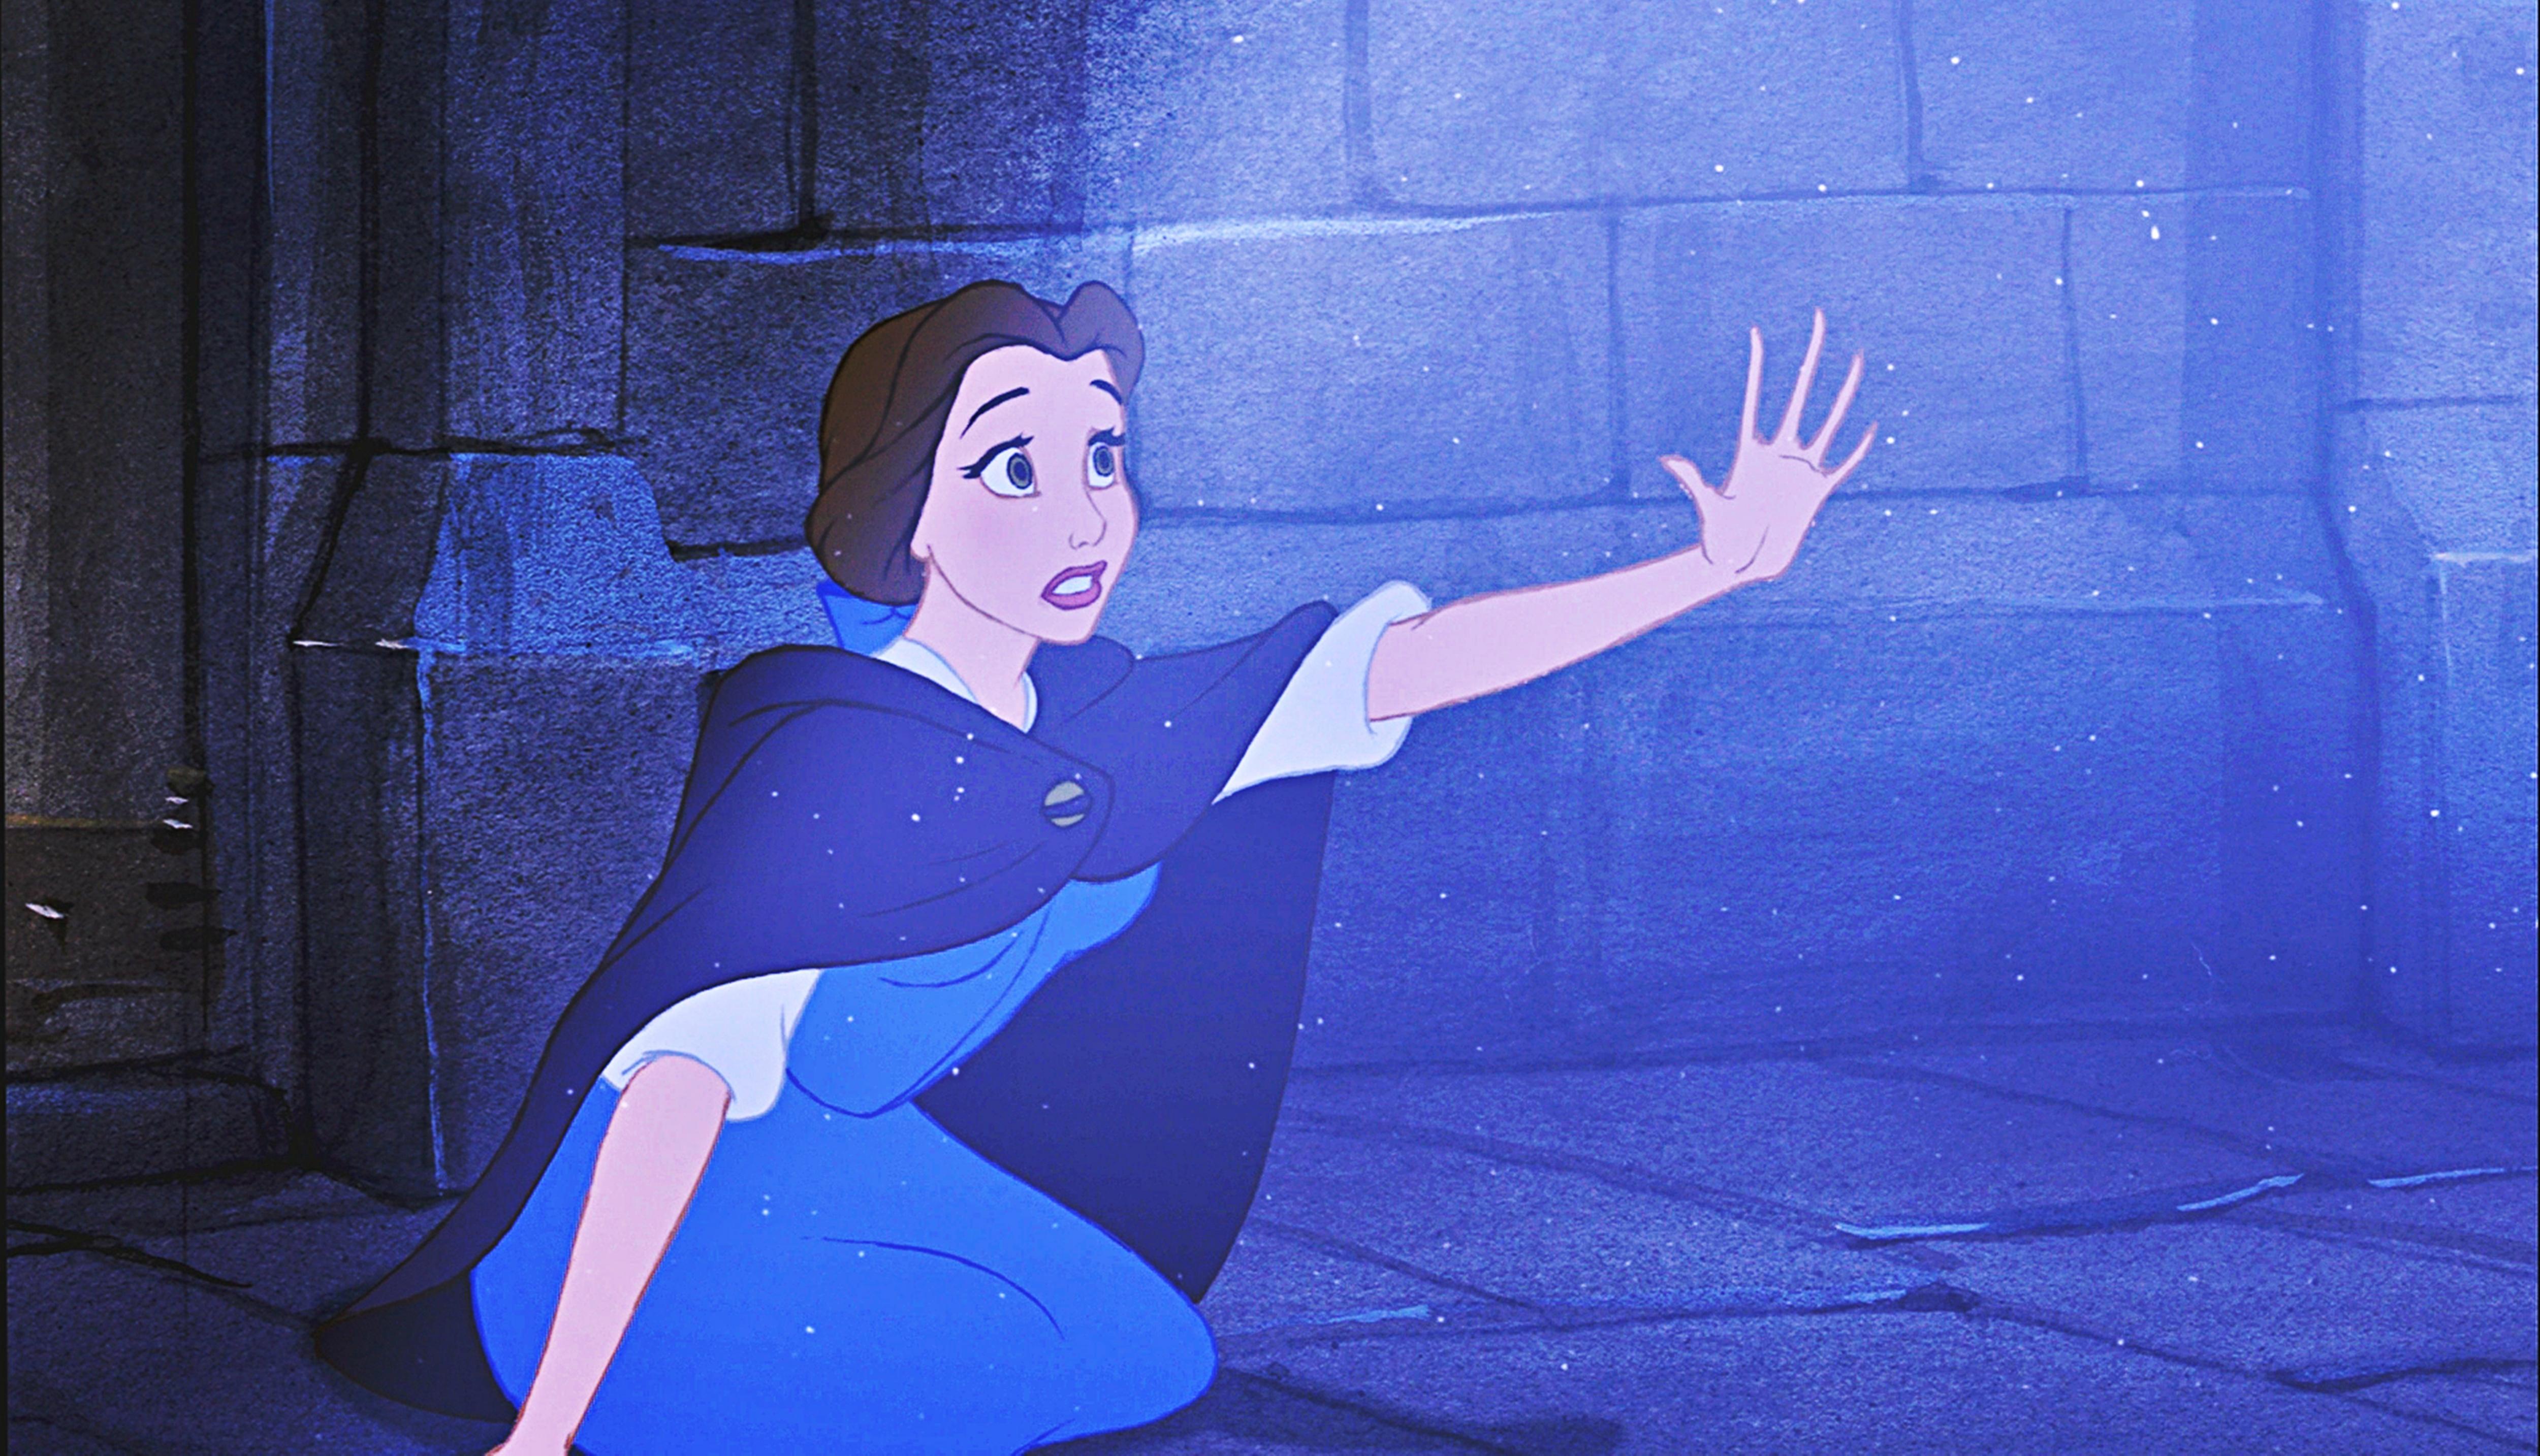 डिज़्नी Princess Screencaps - Princess Belle